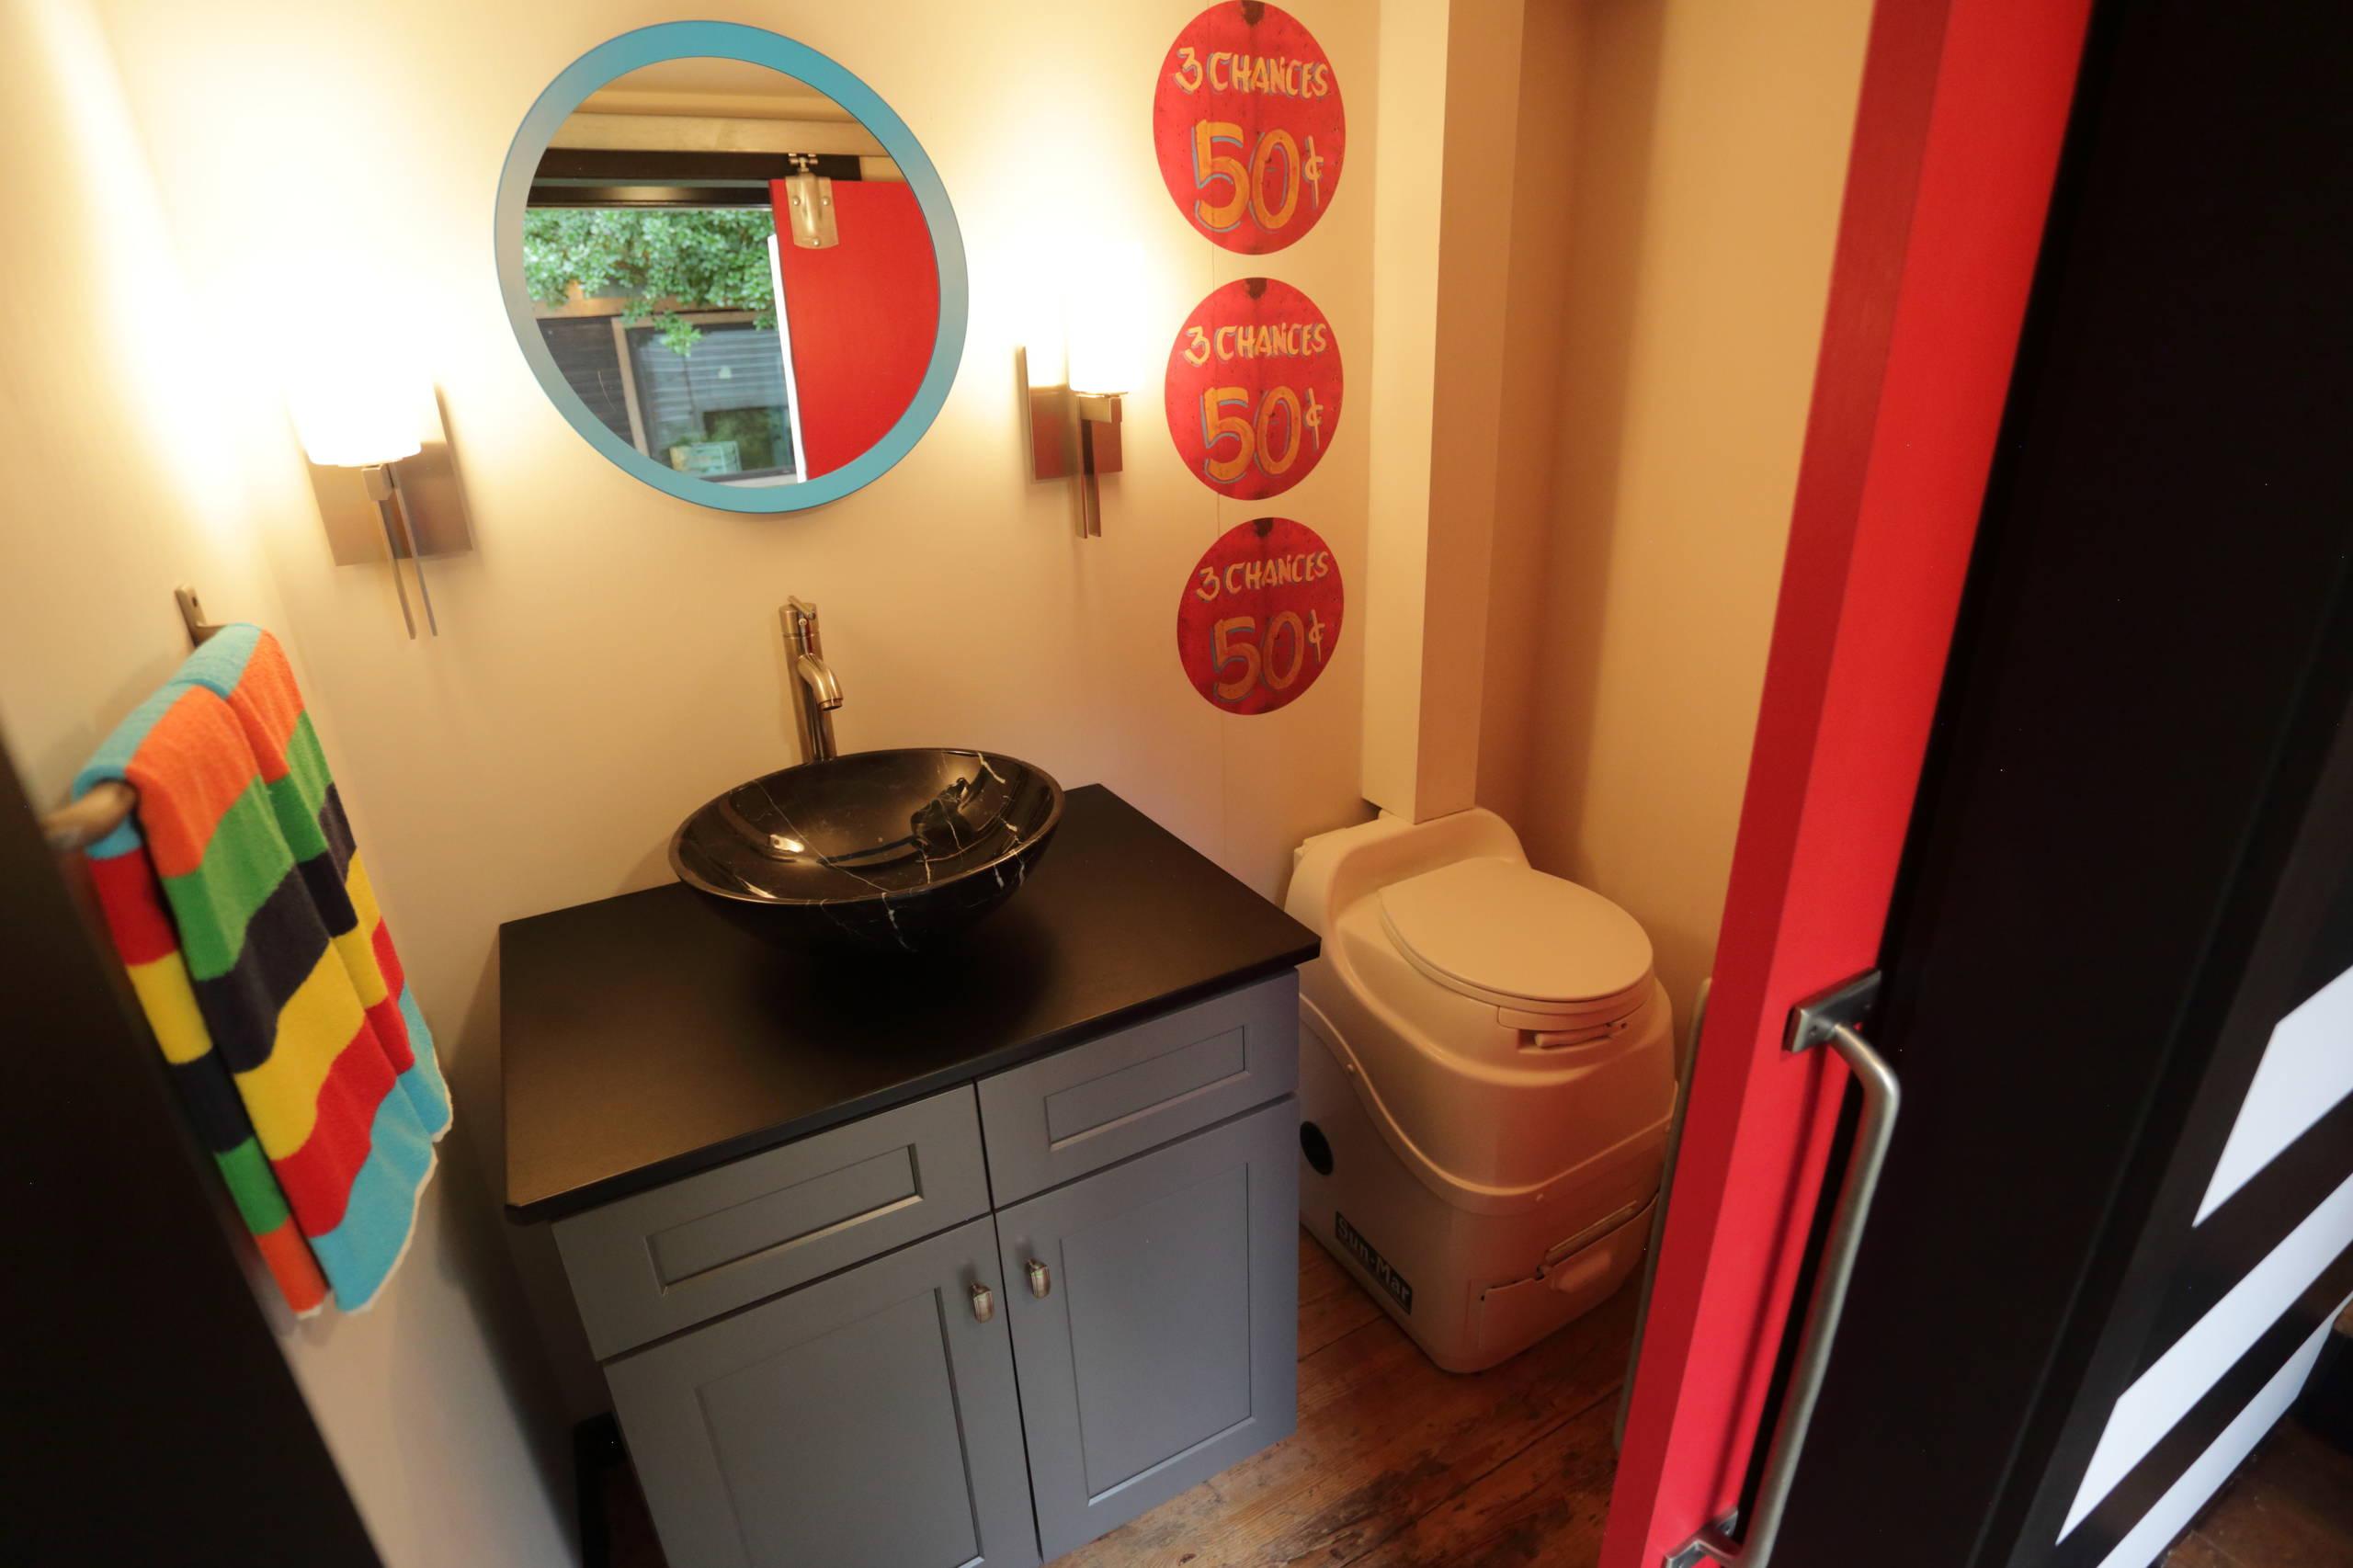 Arcade Semi-Trailer conversion to a tiny home